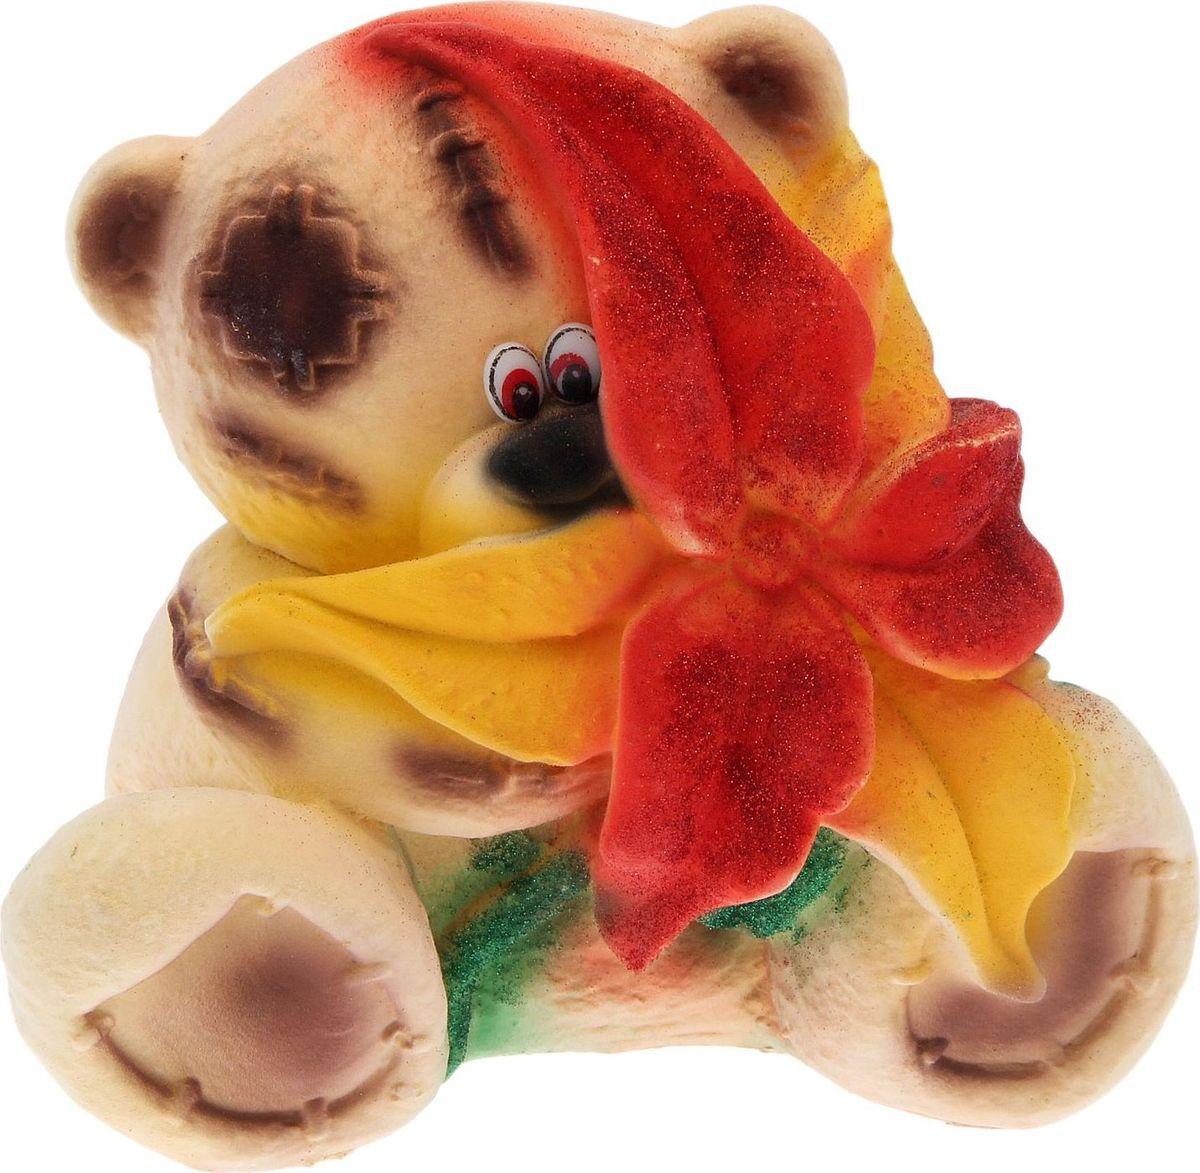 Копилка Premium Gips Тед с цветком, 20 х 22 х 21 см ted baker пальто